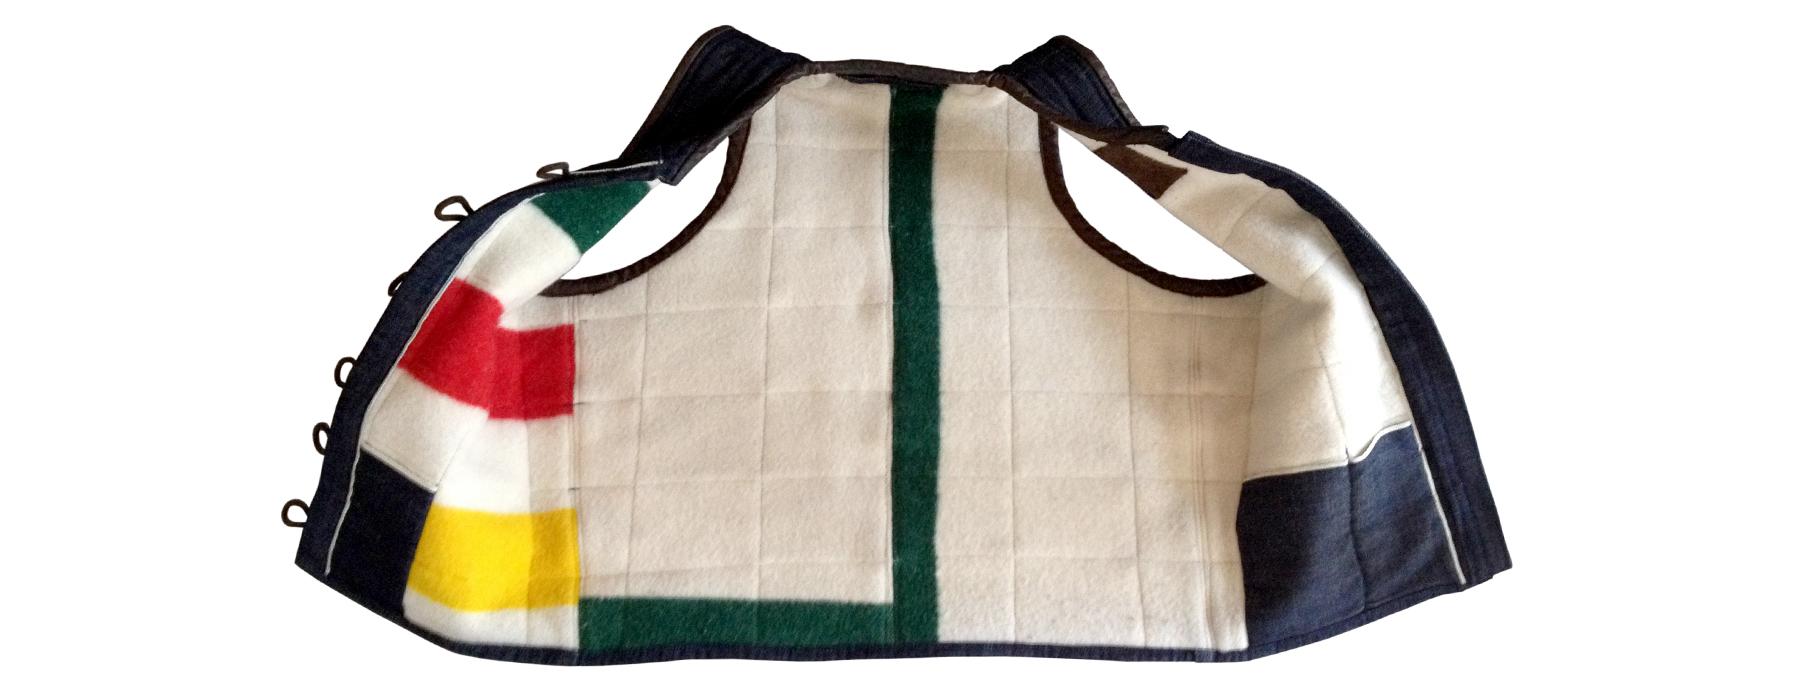 de curae | denim vest, woolen lining – Thorsten Schlesinger